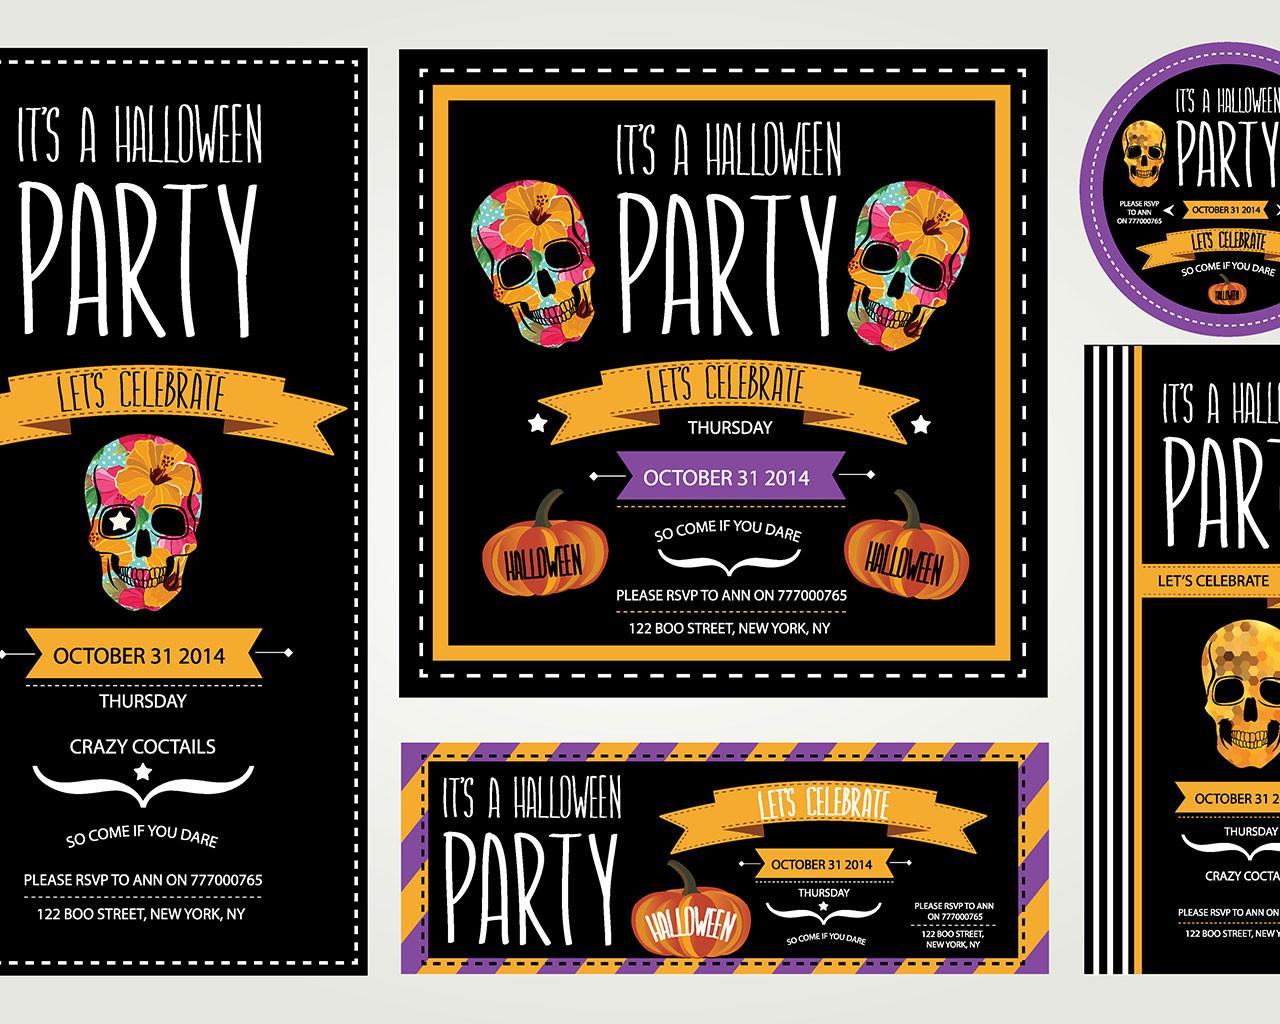 large_Halloween-party-invitations-customization01